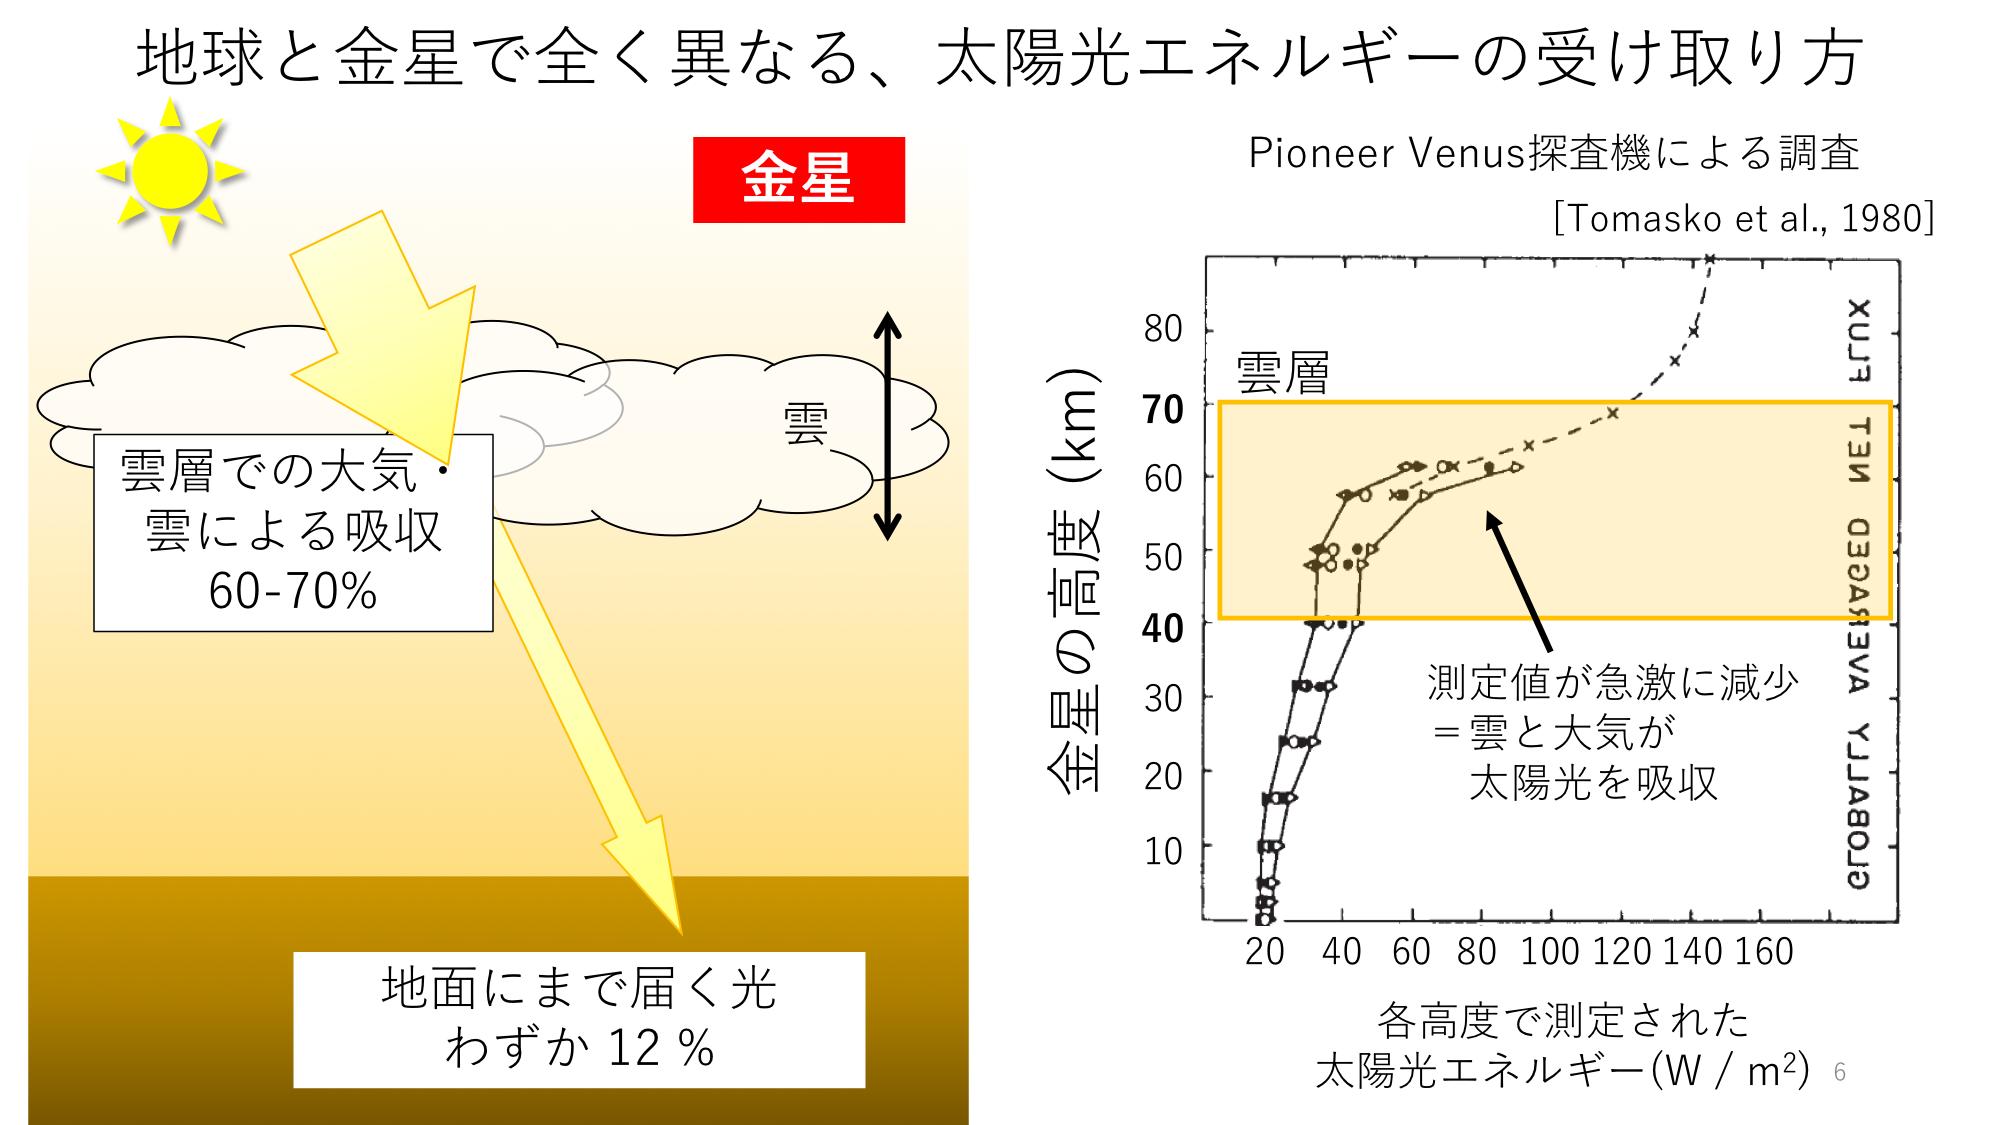 f:id:Imamura:20191119205401p:plain